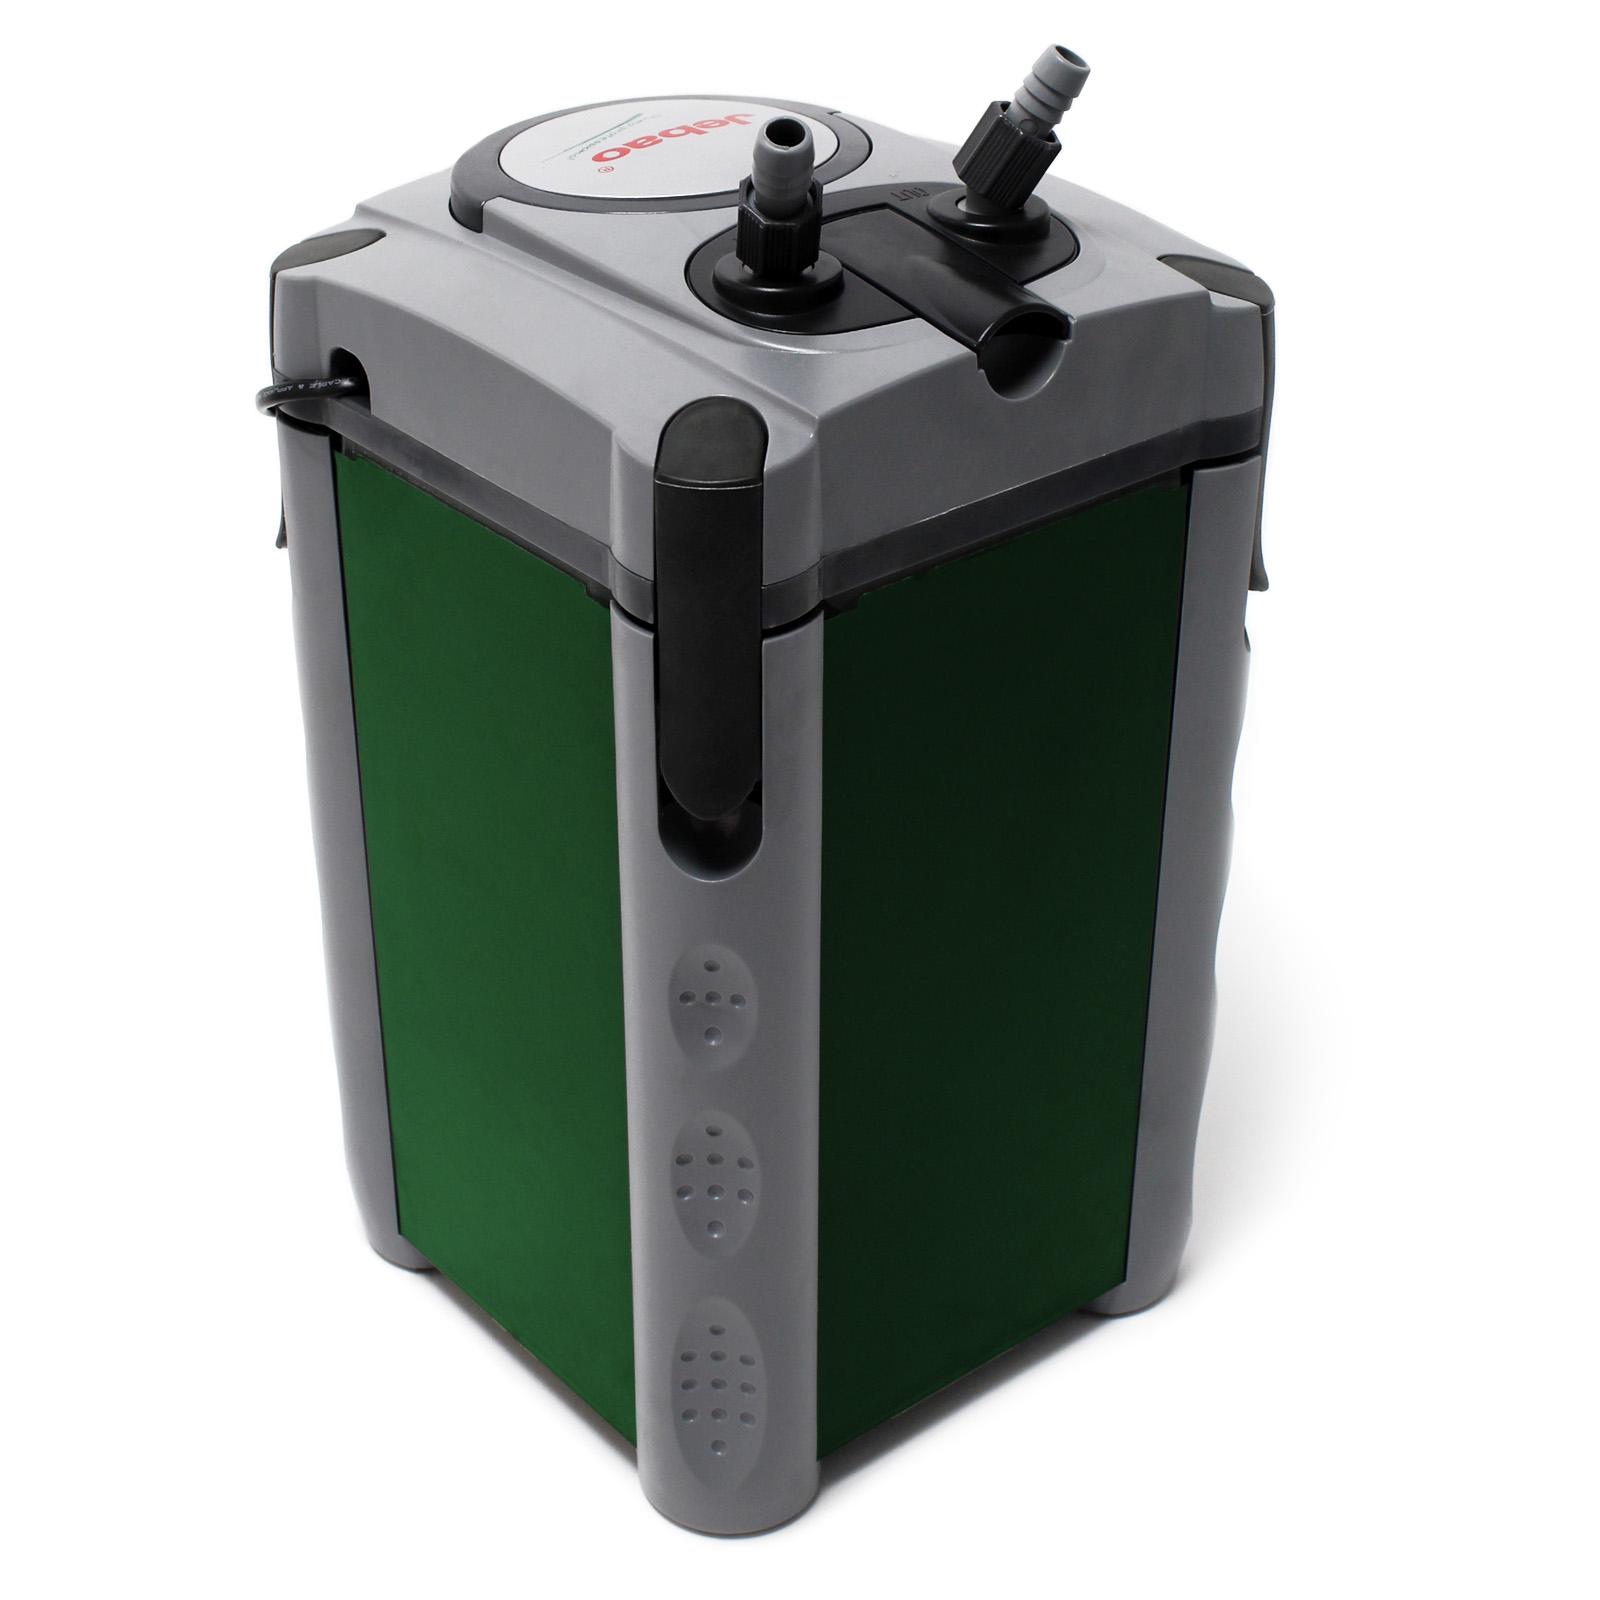 Jebao aquarium external canister 1200l h 4 stage filter for External fish tank filter